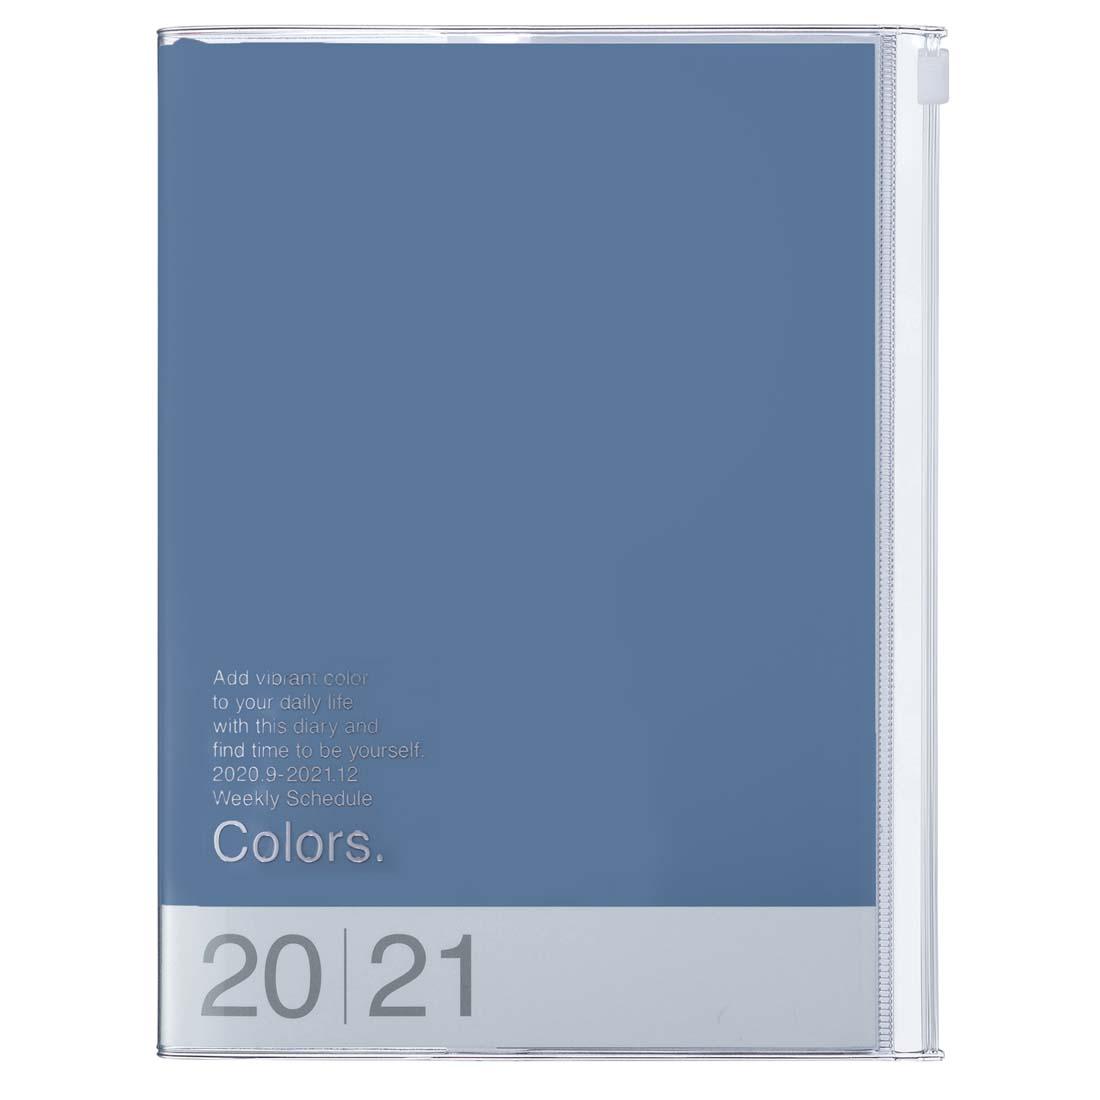 21DRI-HV02-BL